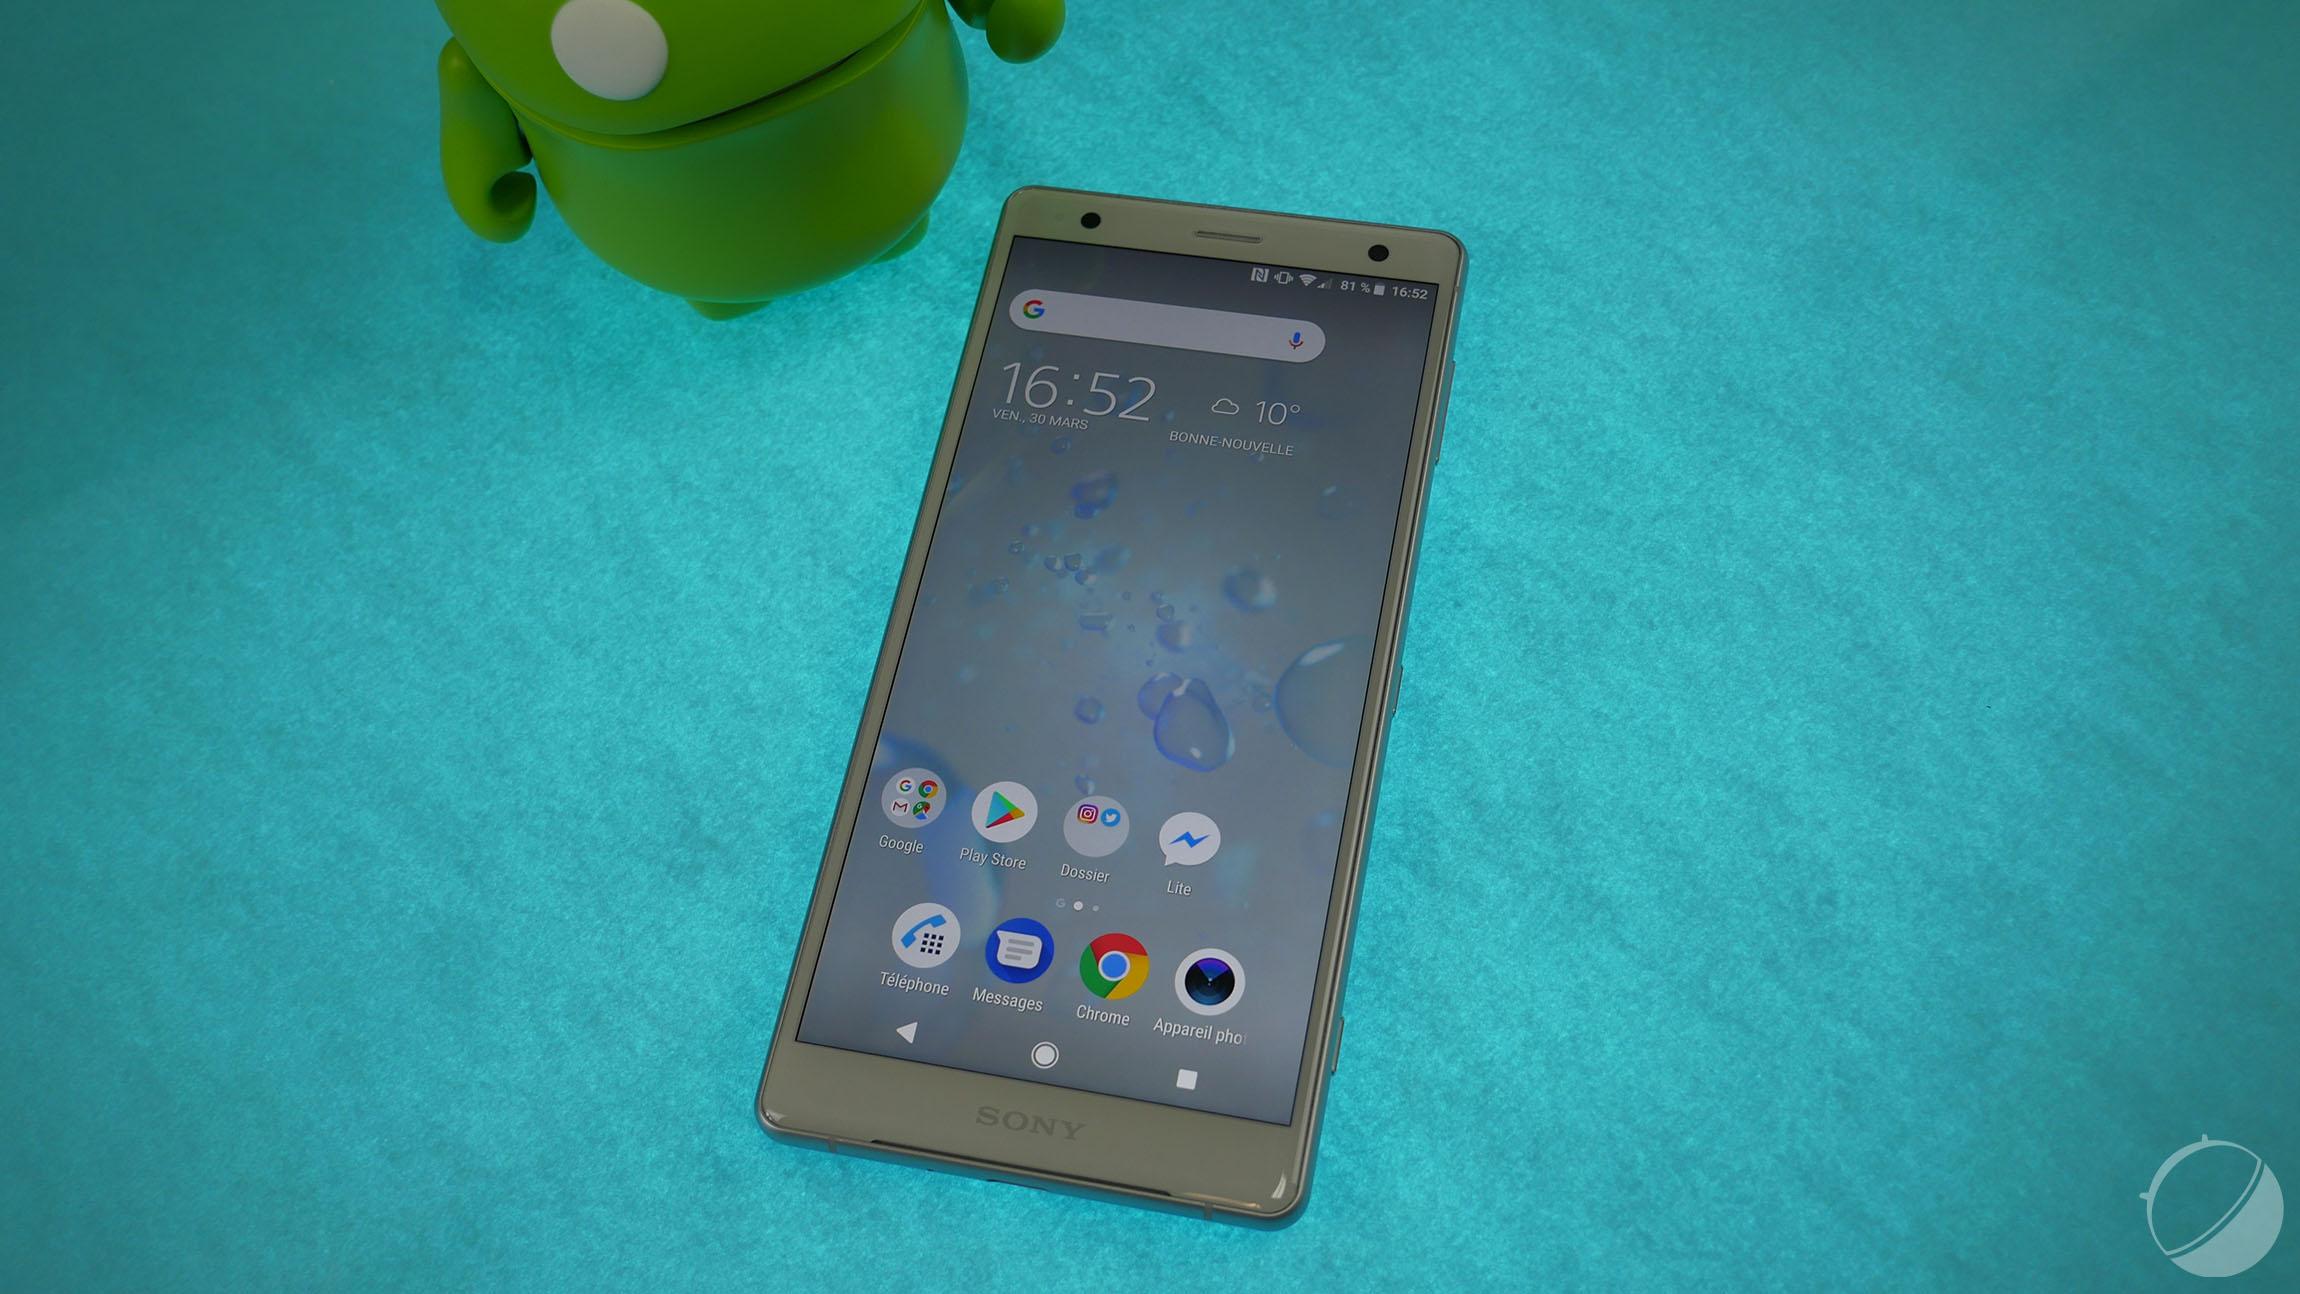 Le Sony Xperia XZ2 se met à jour vers Android 9 Pie